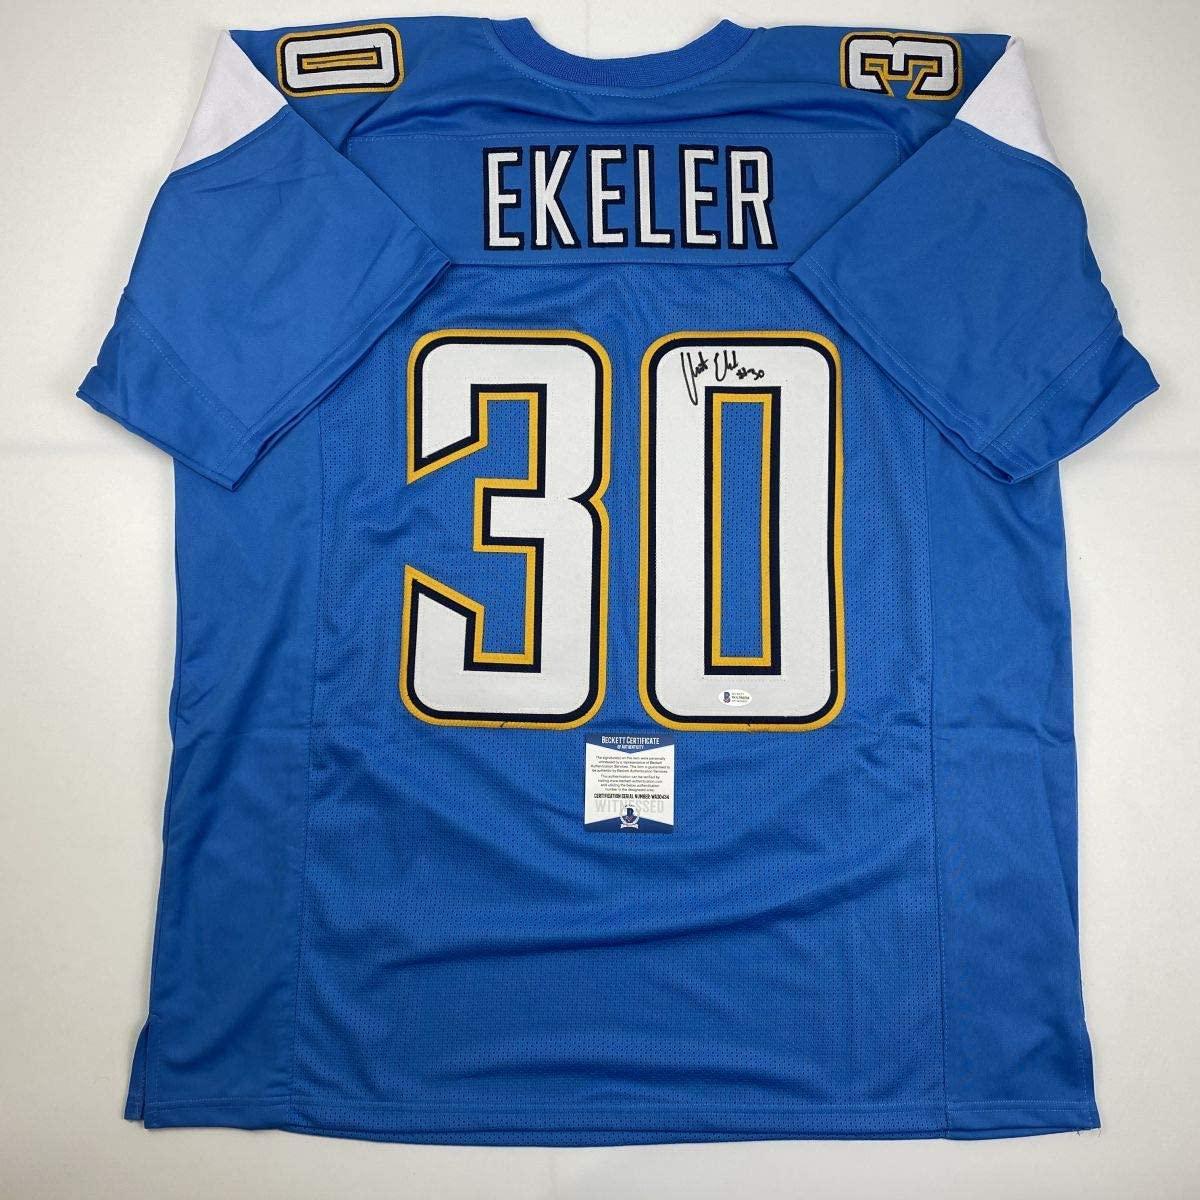 Autographed/Signed Austin Ekeler Los Angeles LA Powder Blue Football Jersey Beckett BAS COA